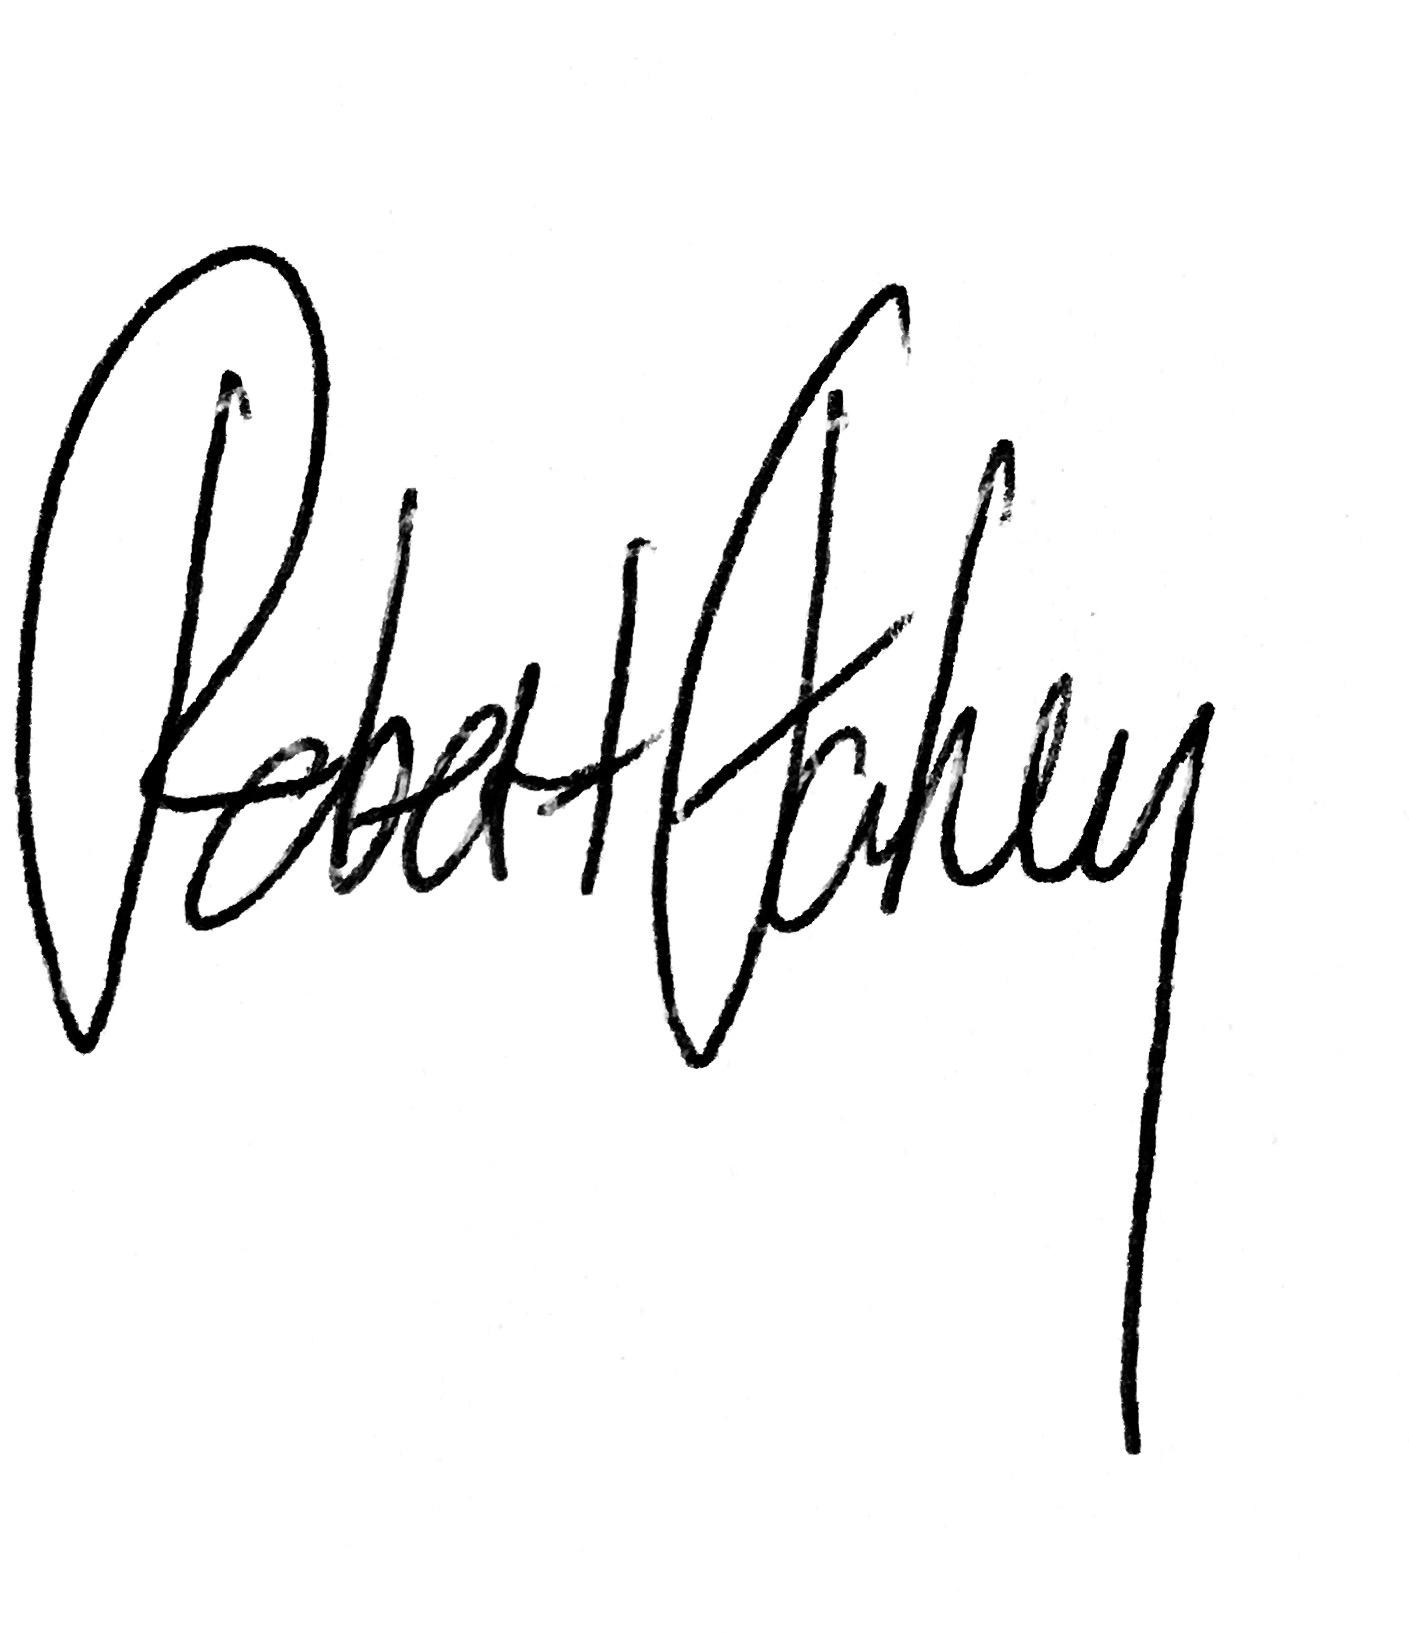 Robert Fahey signature